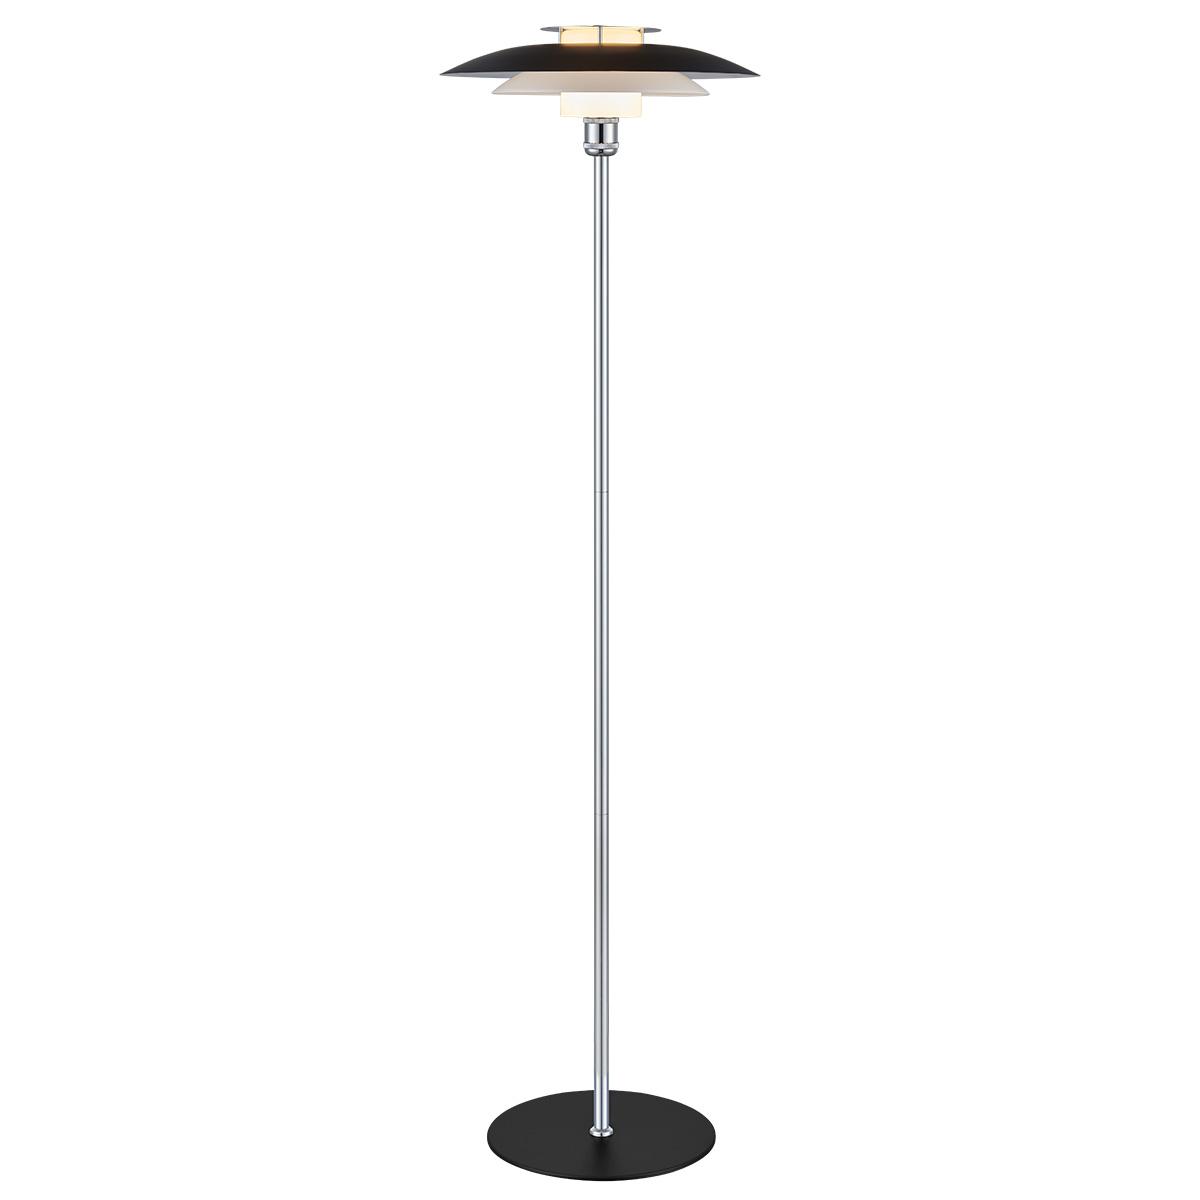 Halo Design gulvlampe - Rivalto - Sort/krom